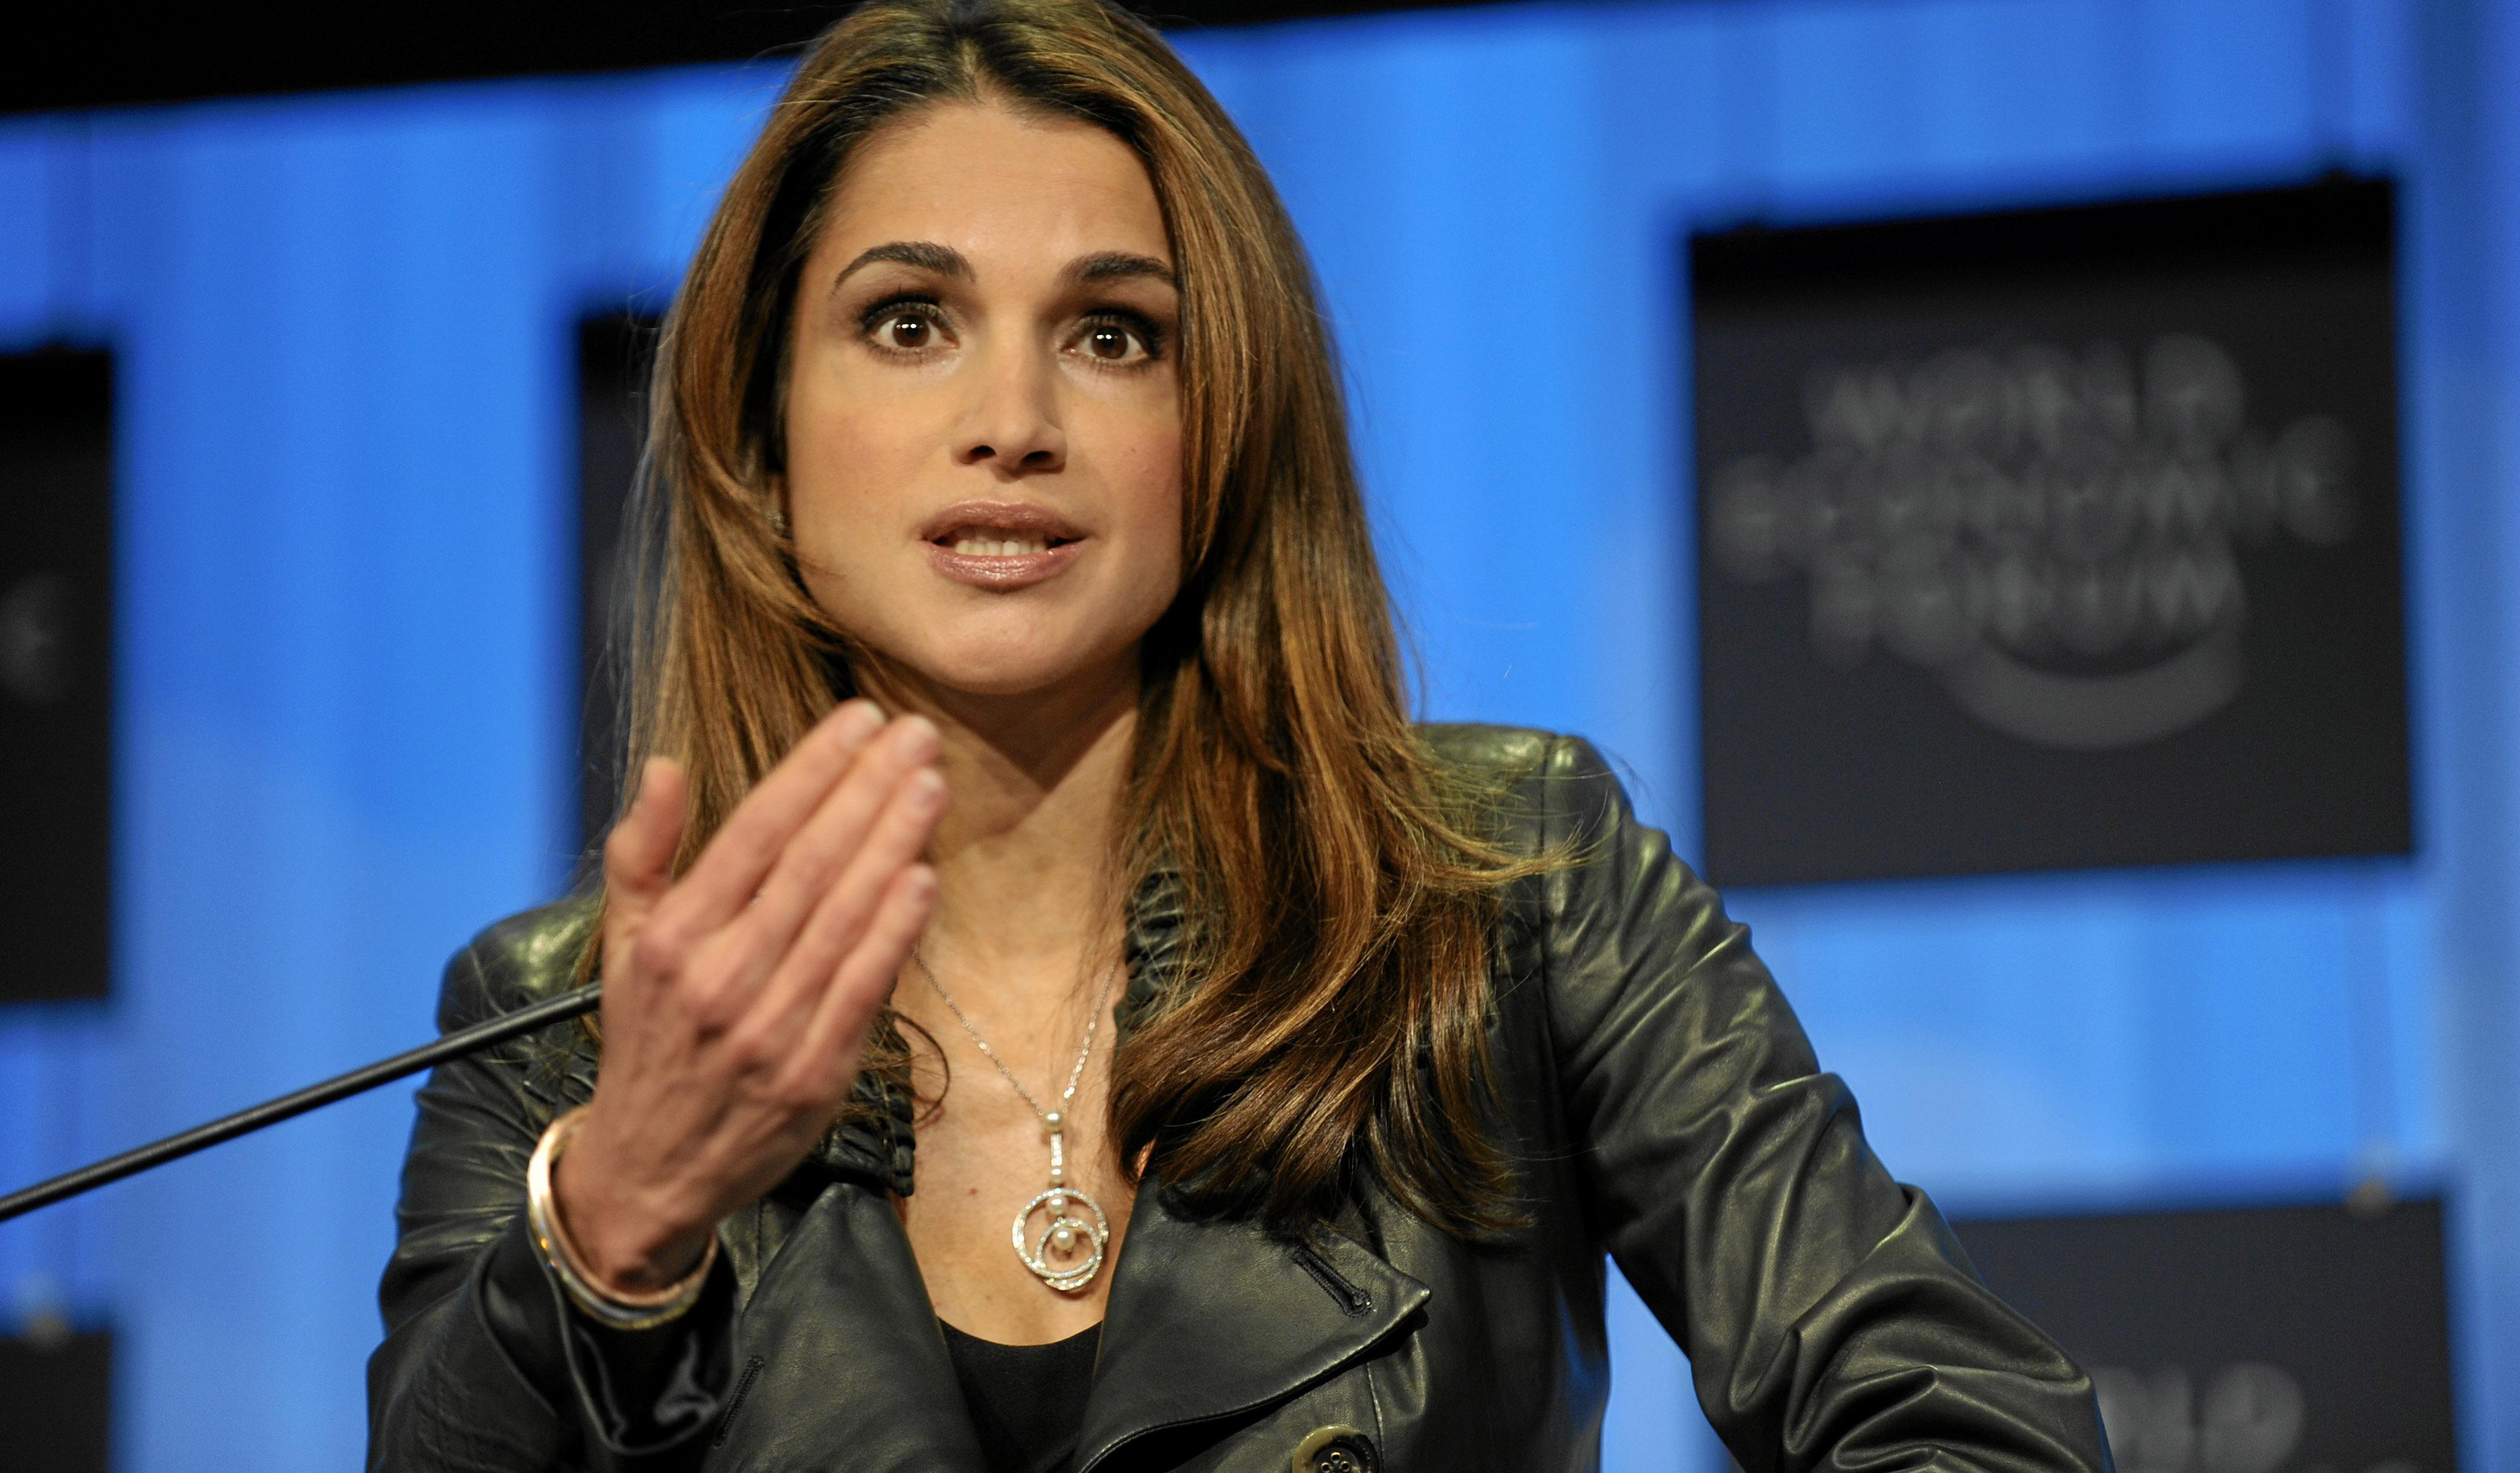 the queen of jordan at the world economic forum 2010